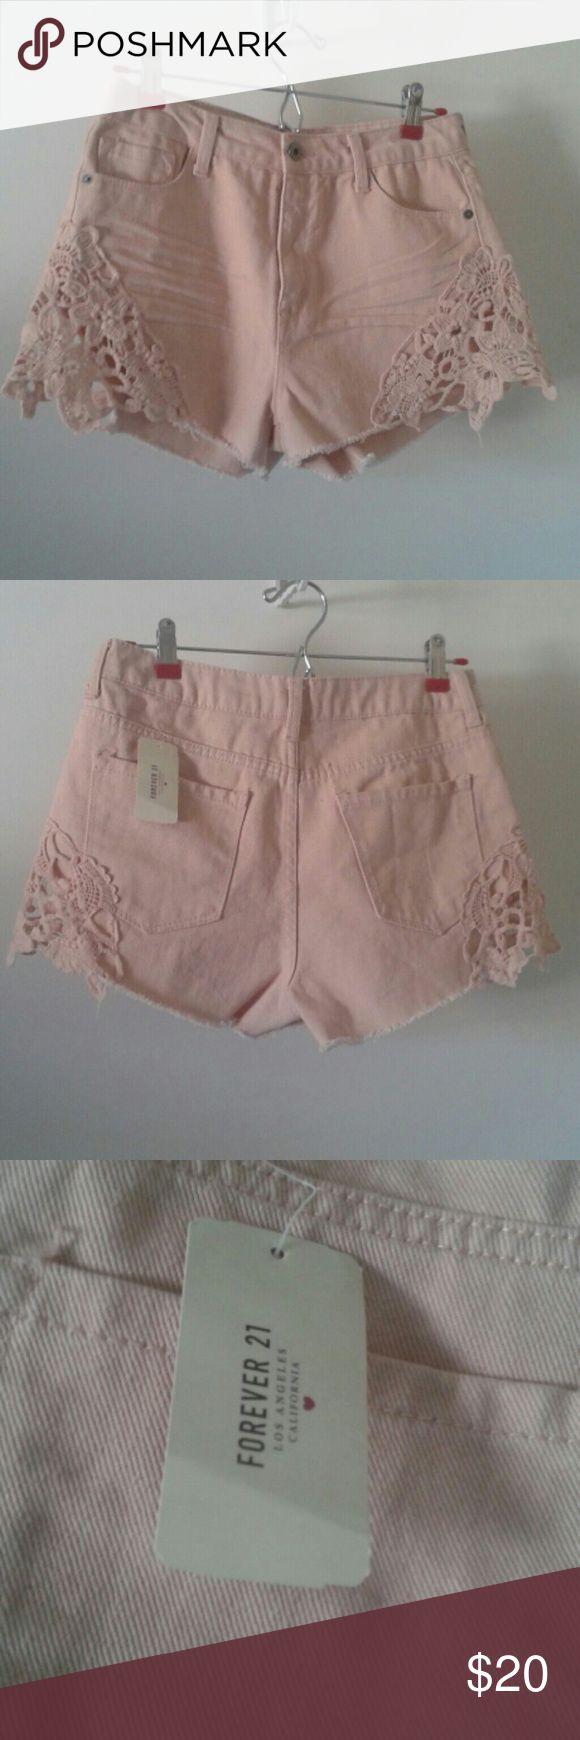 Selling this 💛NWT Forever 21 Highrise Blush Lace Shorts💛 on Poshmark! My username is: lol088. #shopmycloset #poshmark #fashion #shopping #style #forsale #Forever 21 #Pants